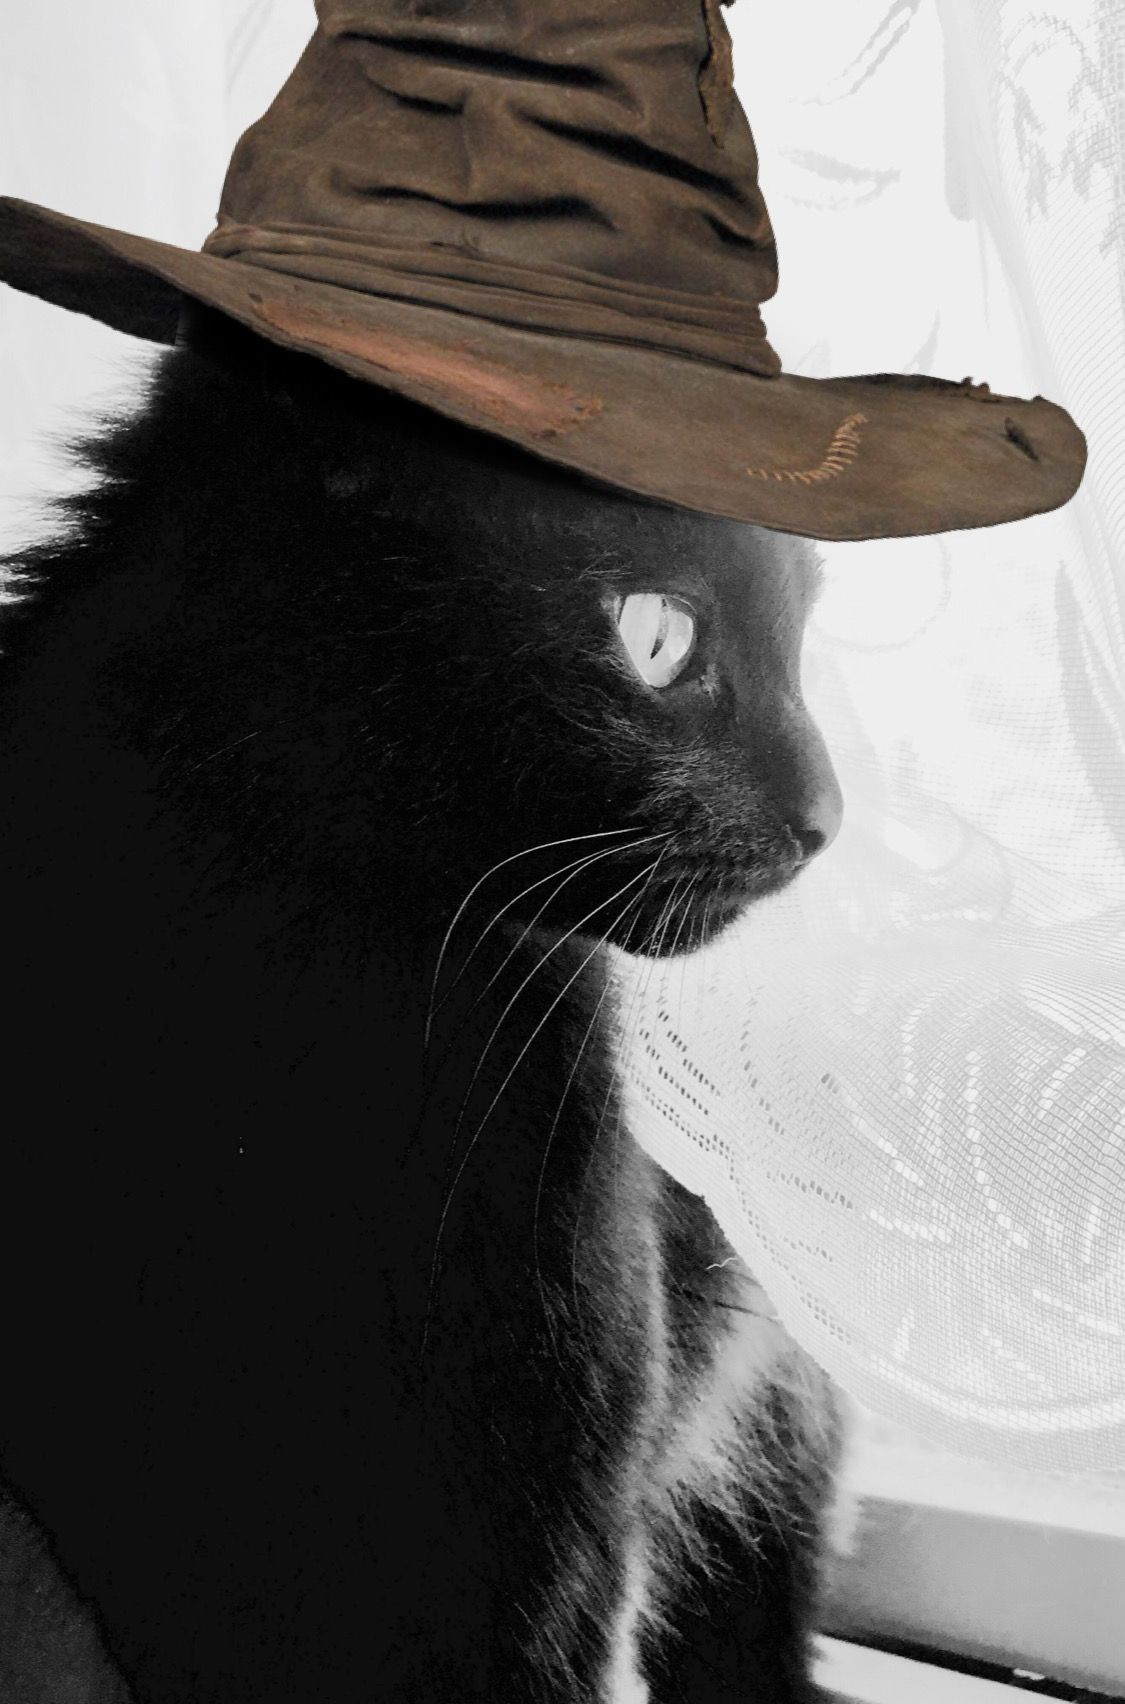 Black cats are lucky 💜 Cowboy hats, Black cat, Cowboy